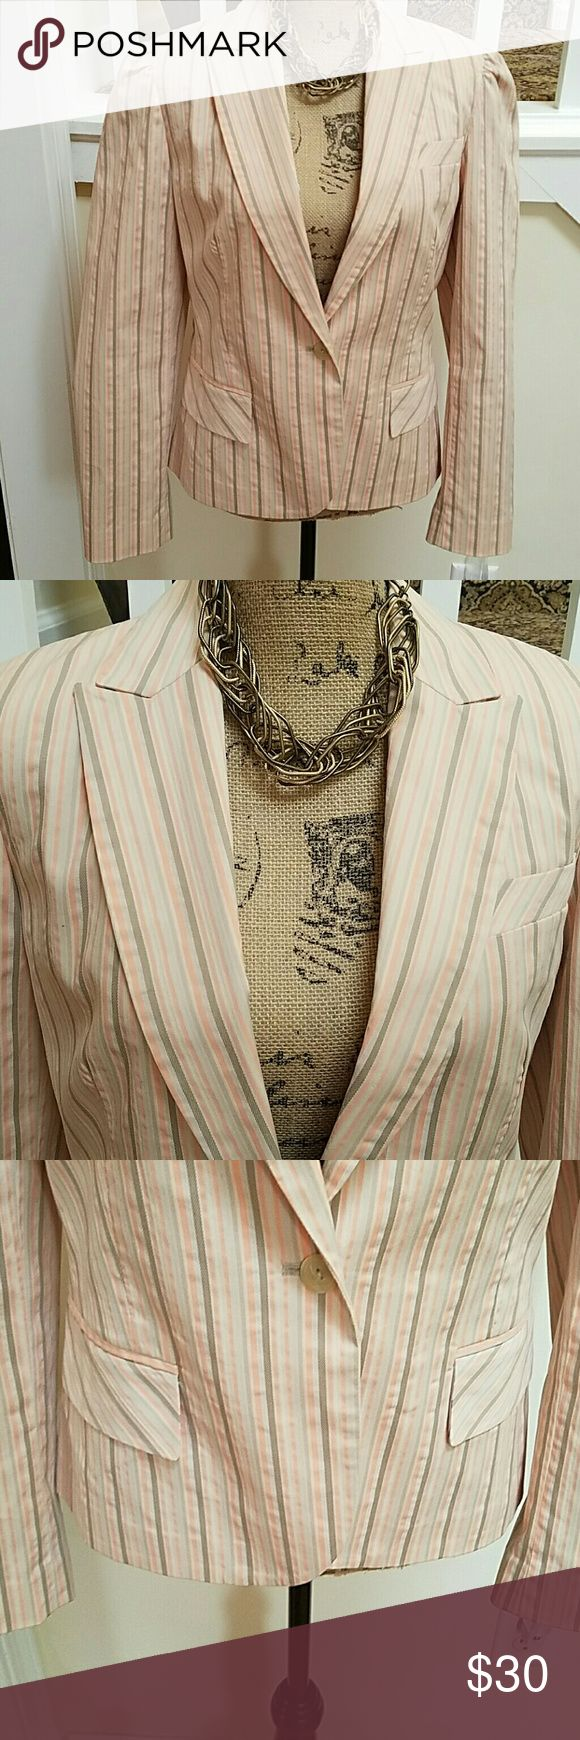 CLASSIC SEERSUCKER BLAZER Nice and cool stripped seersucker blazer. Shell sold in seperate listing. Apostrophe  Jackets & Coats Blazers